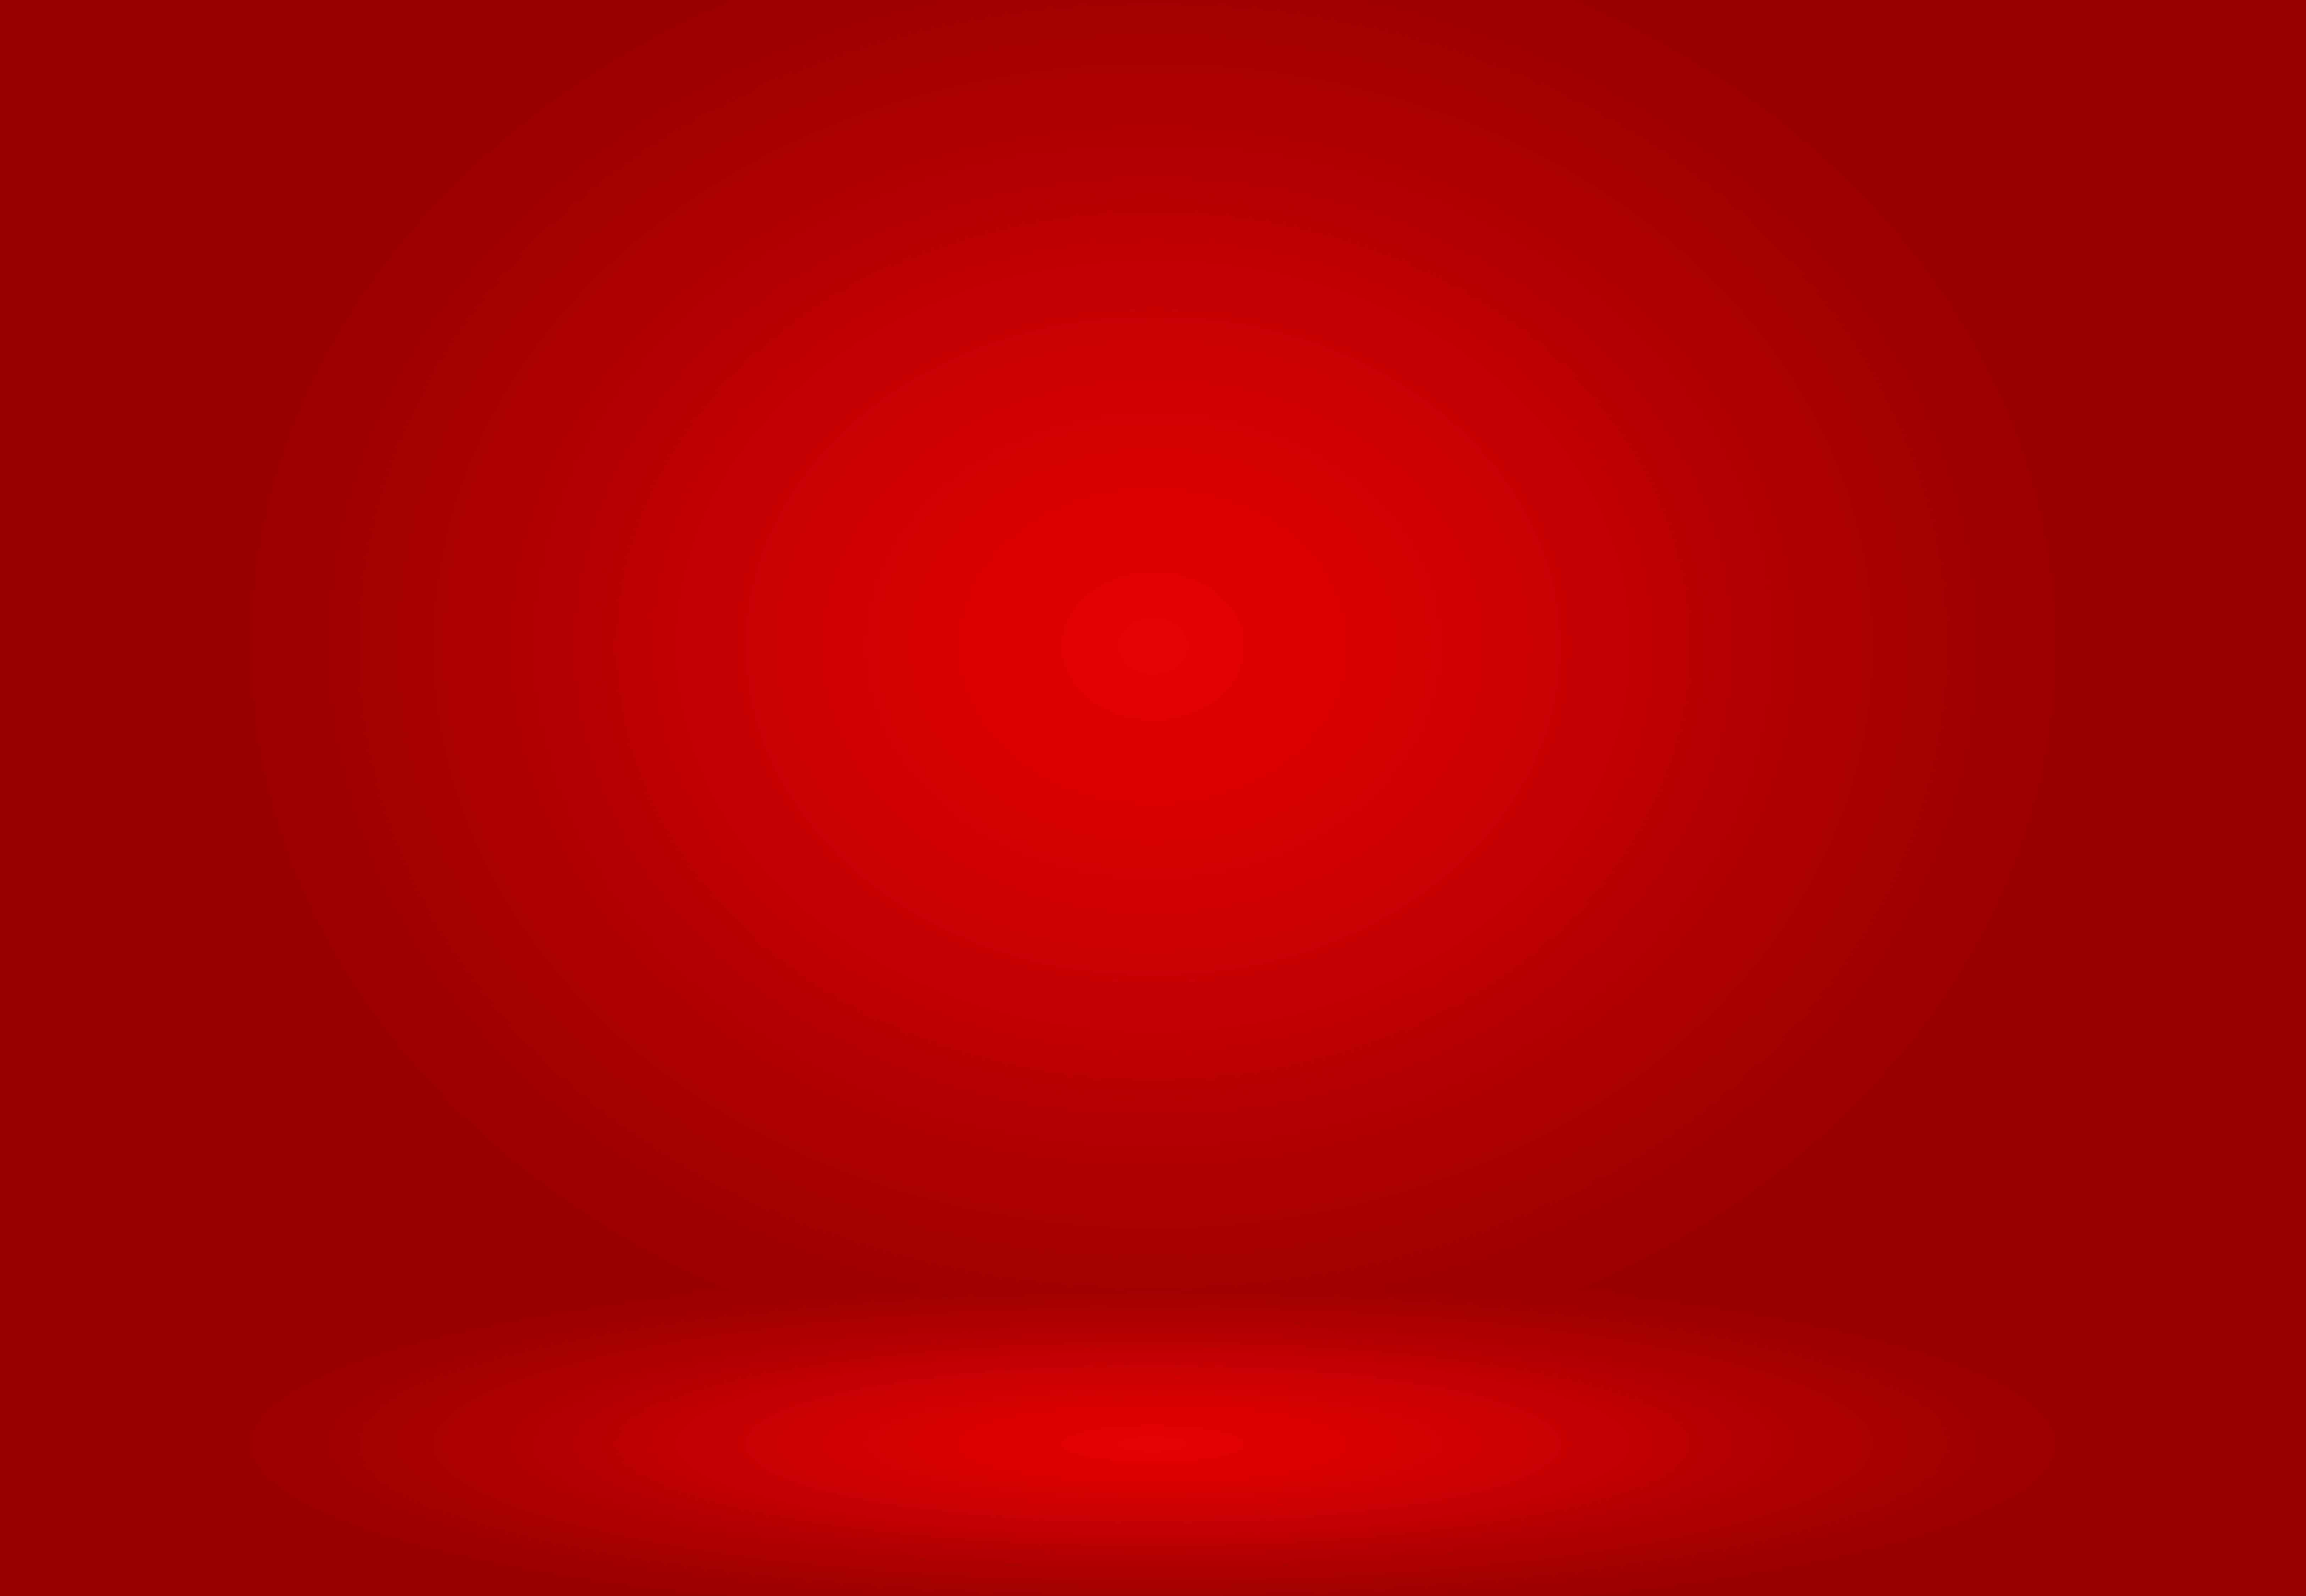 Red Color Psychology